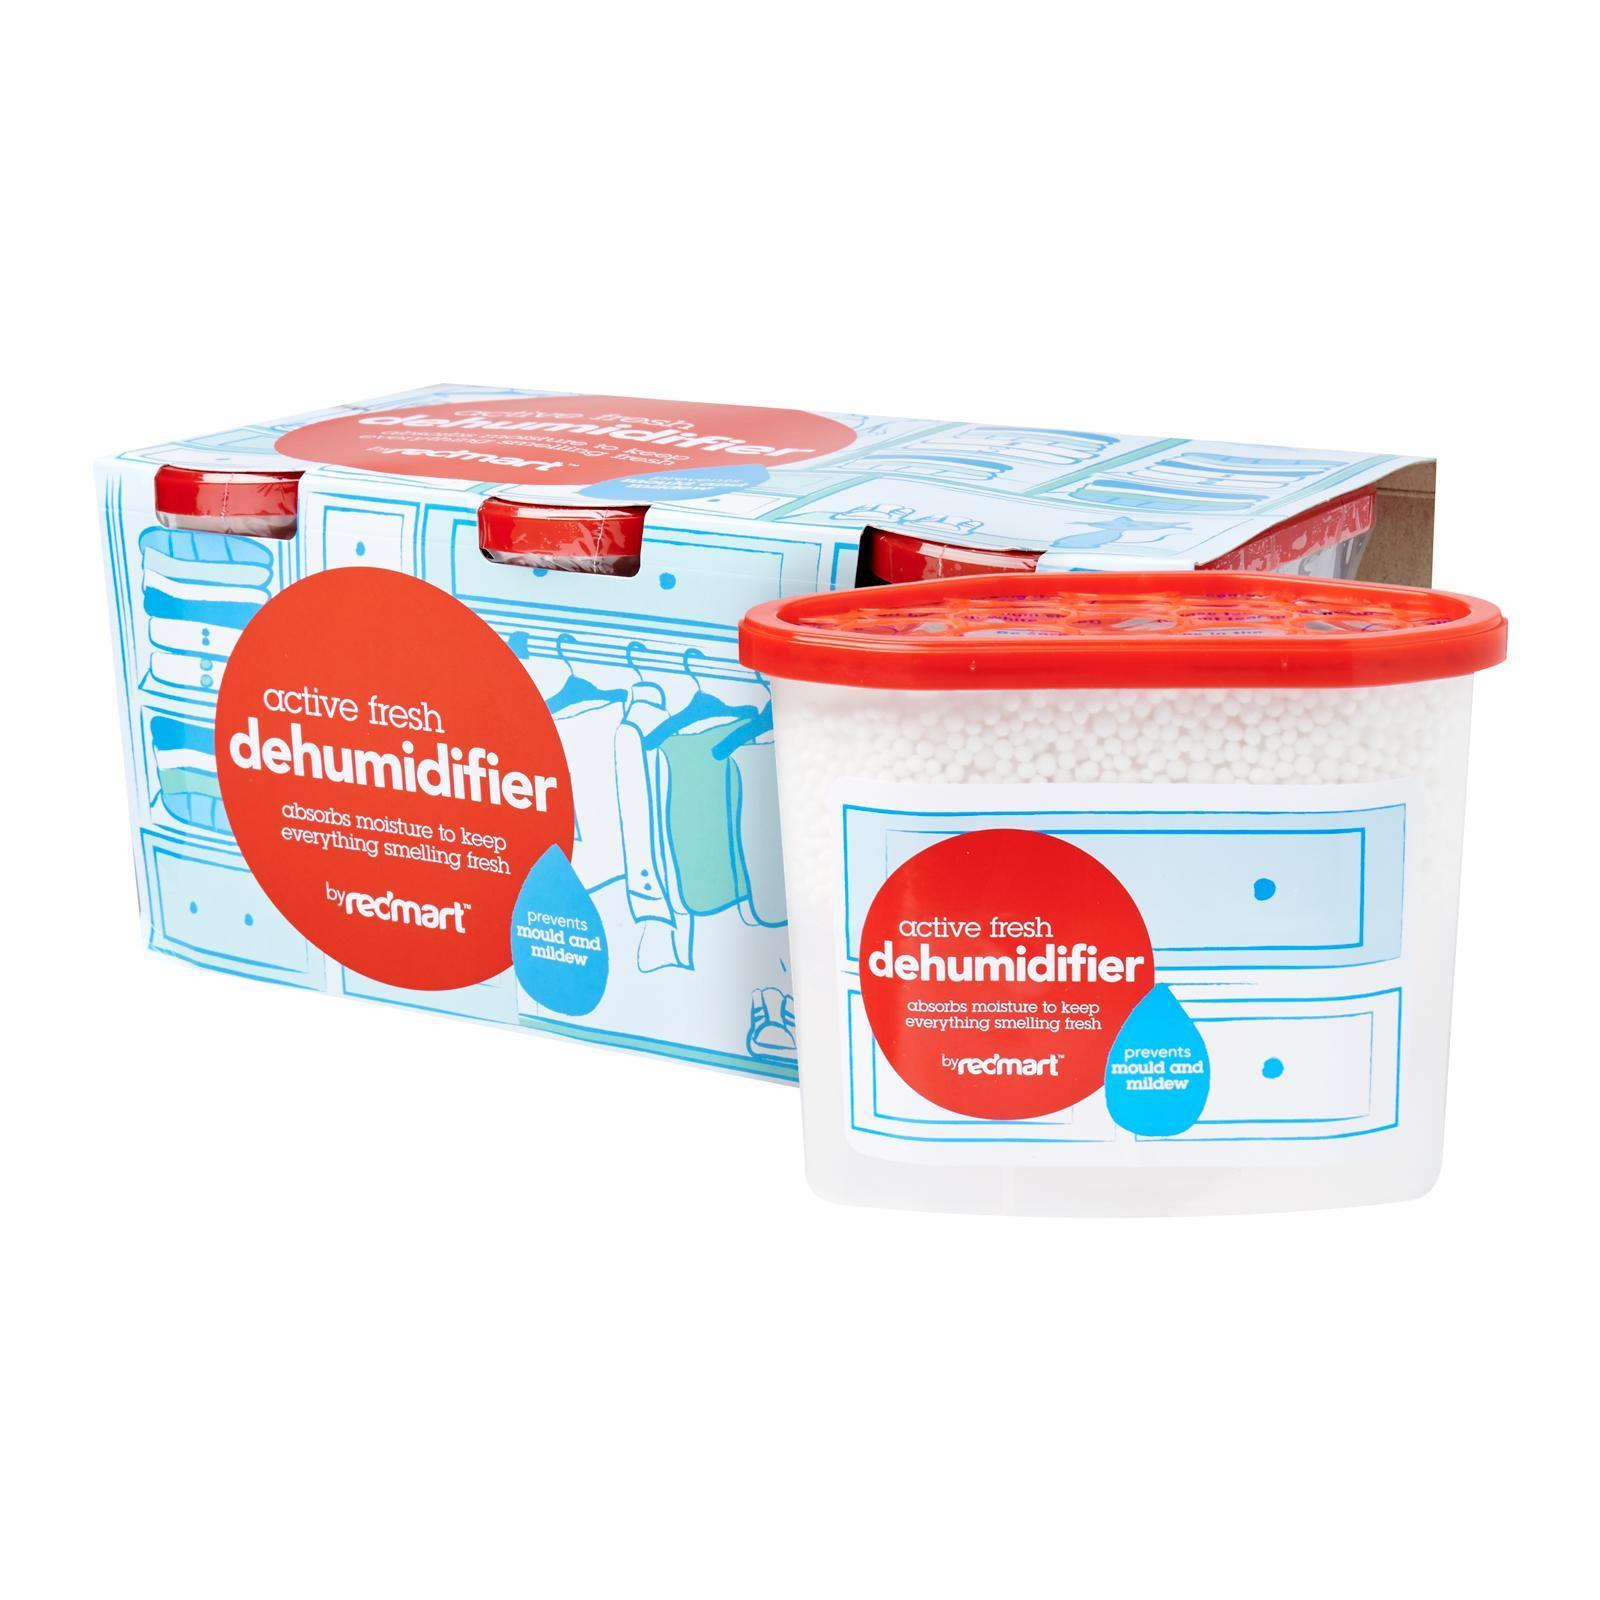 RedMart Dehumidifier